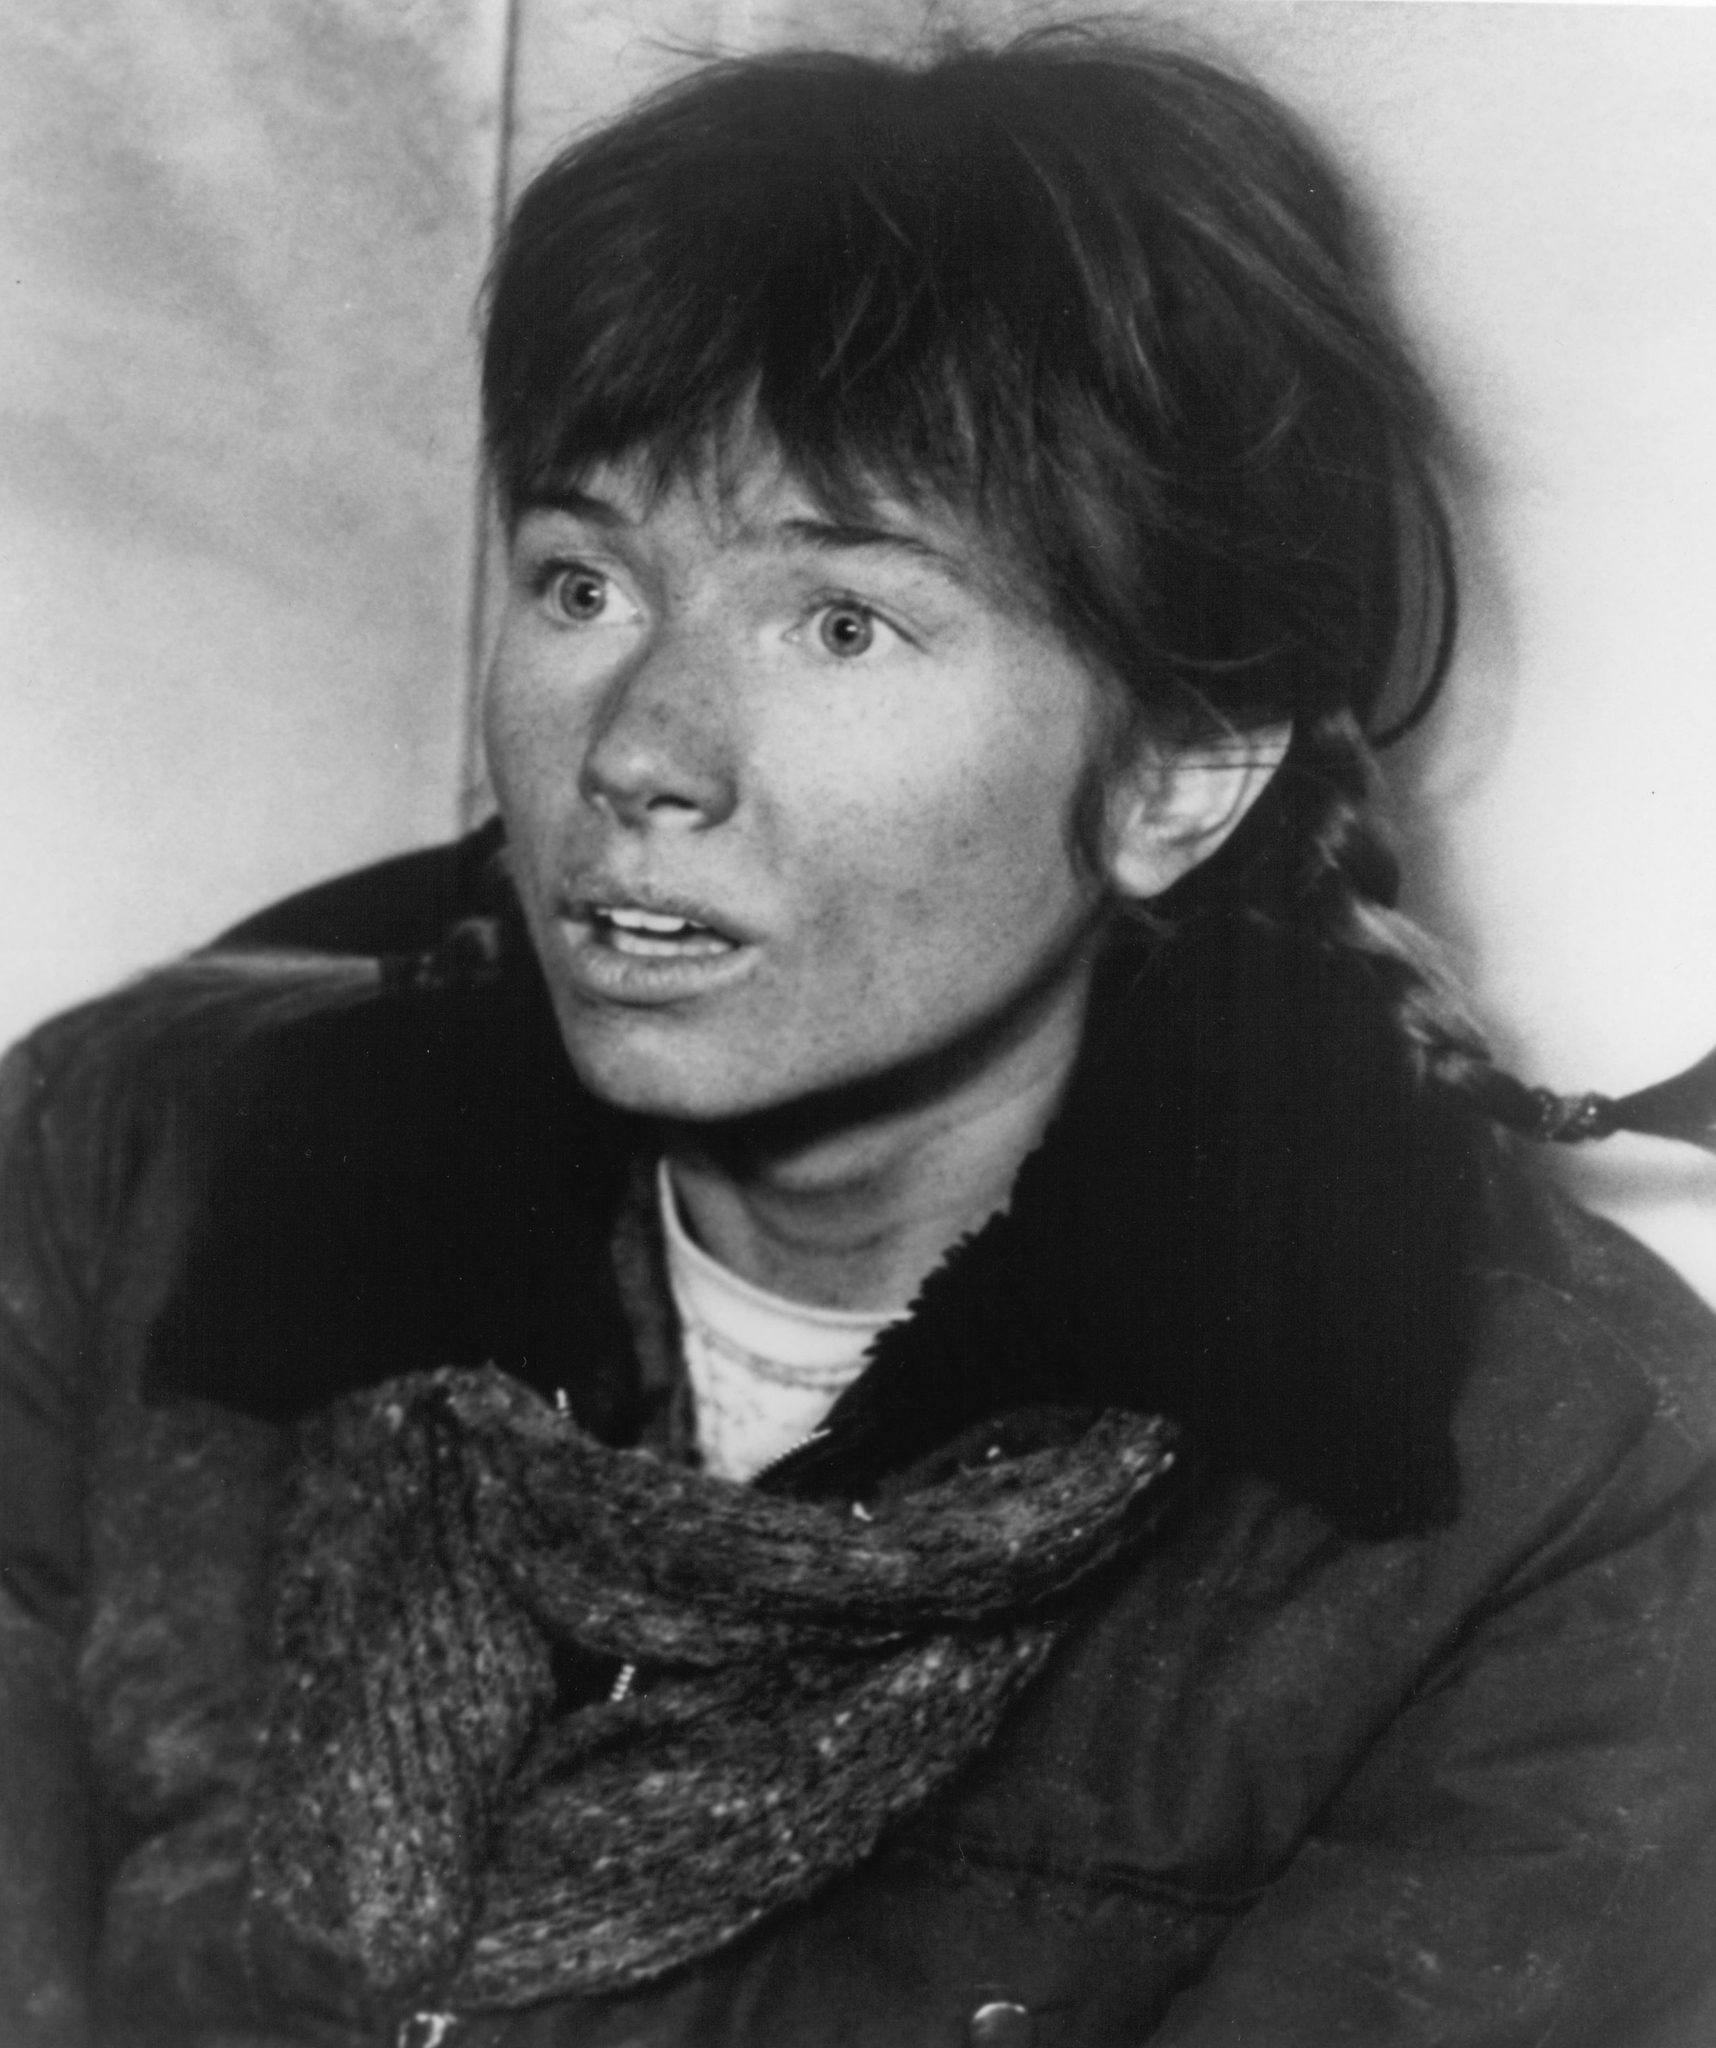 Rebecca De Mornay in Runaway Train (1985)